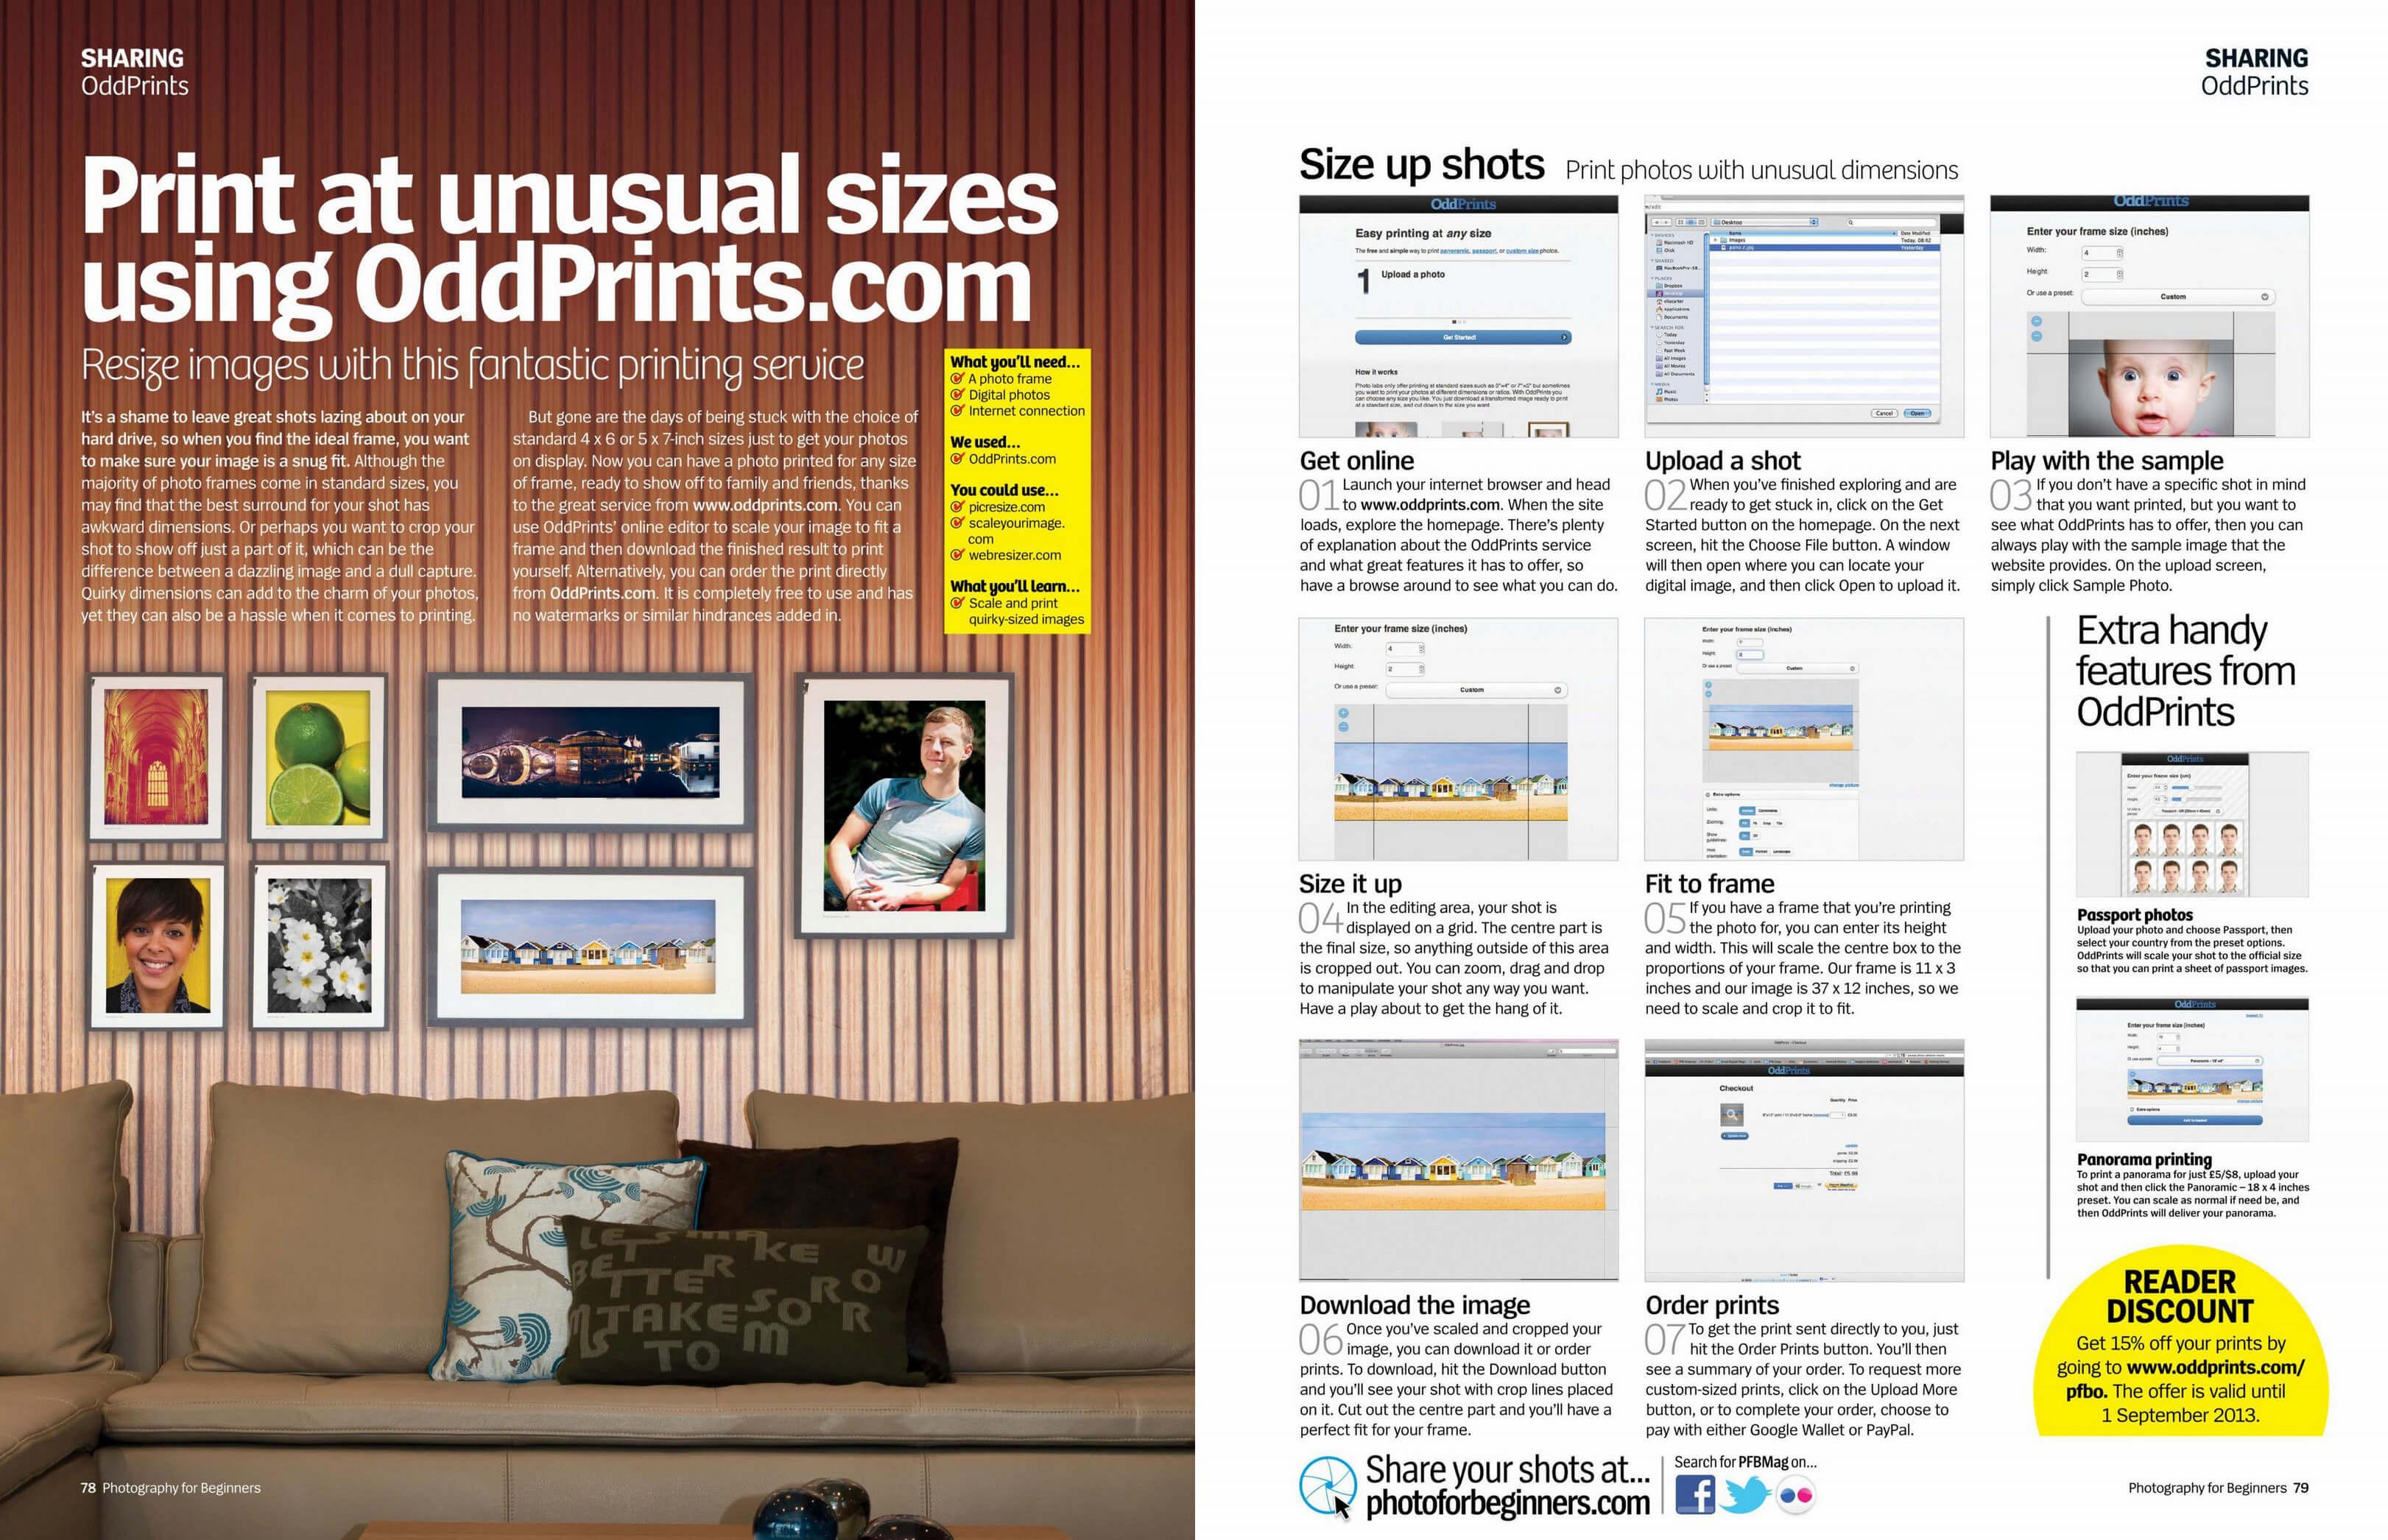 oddprints easy printing for